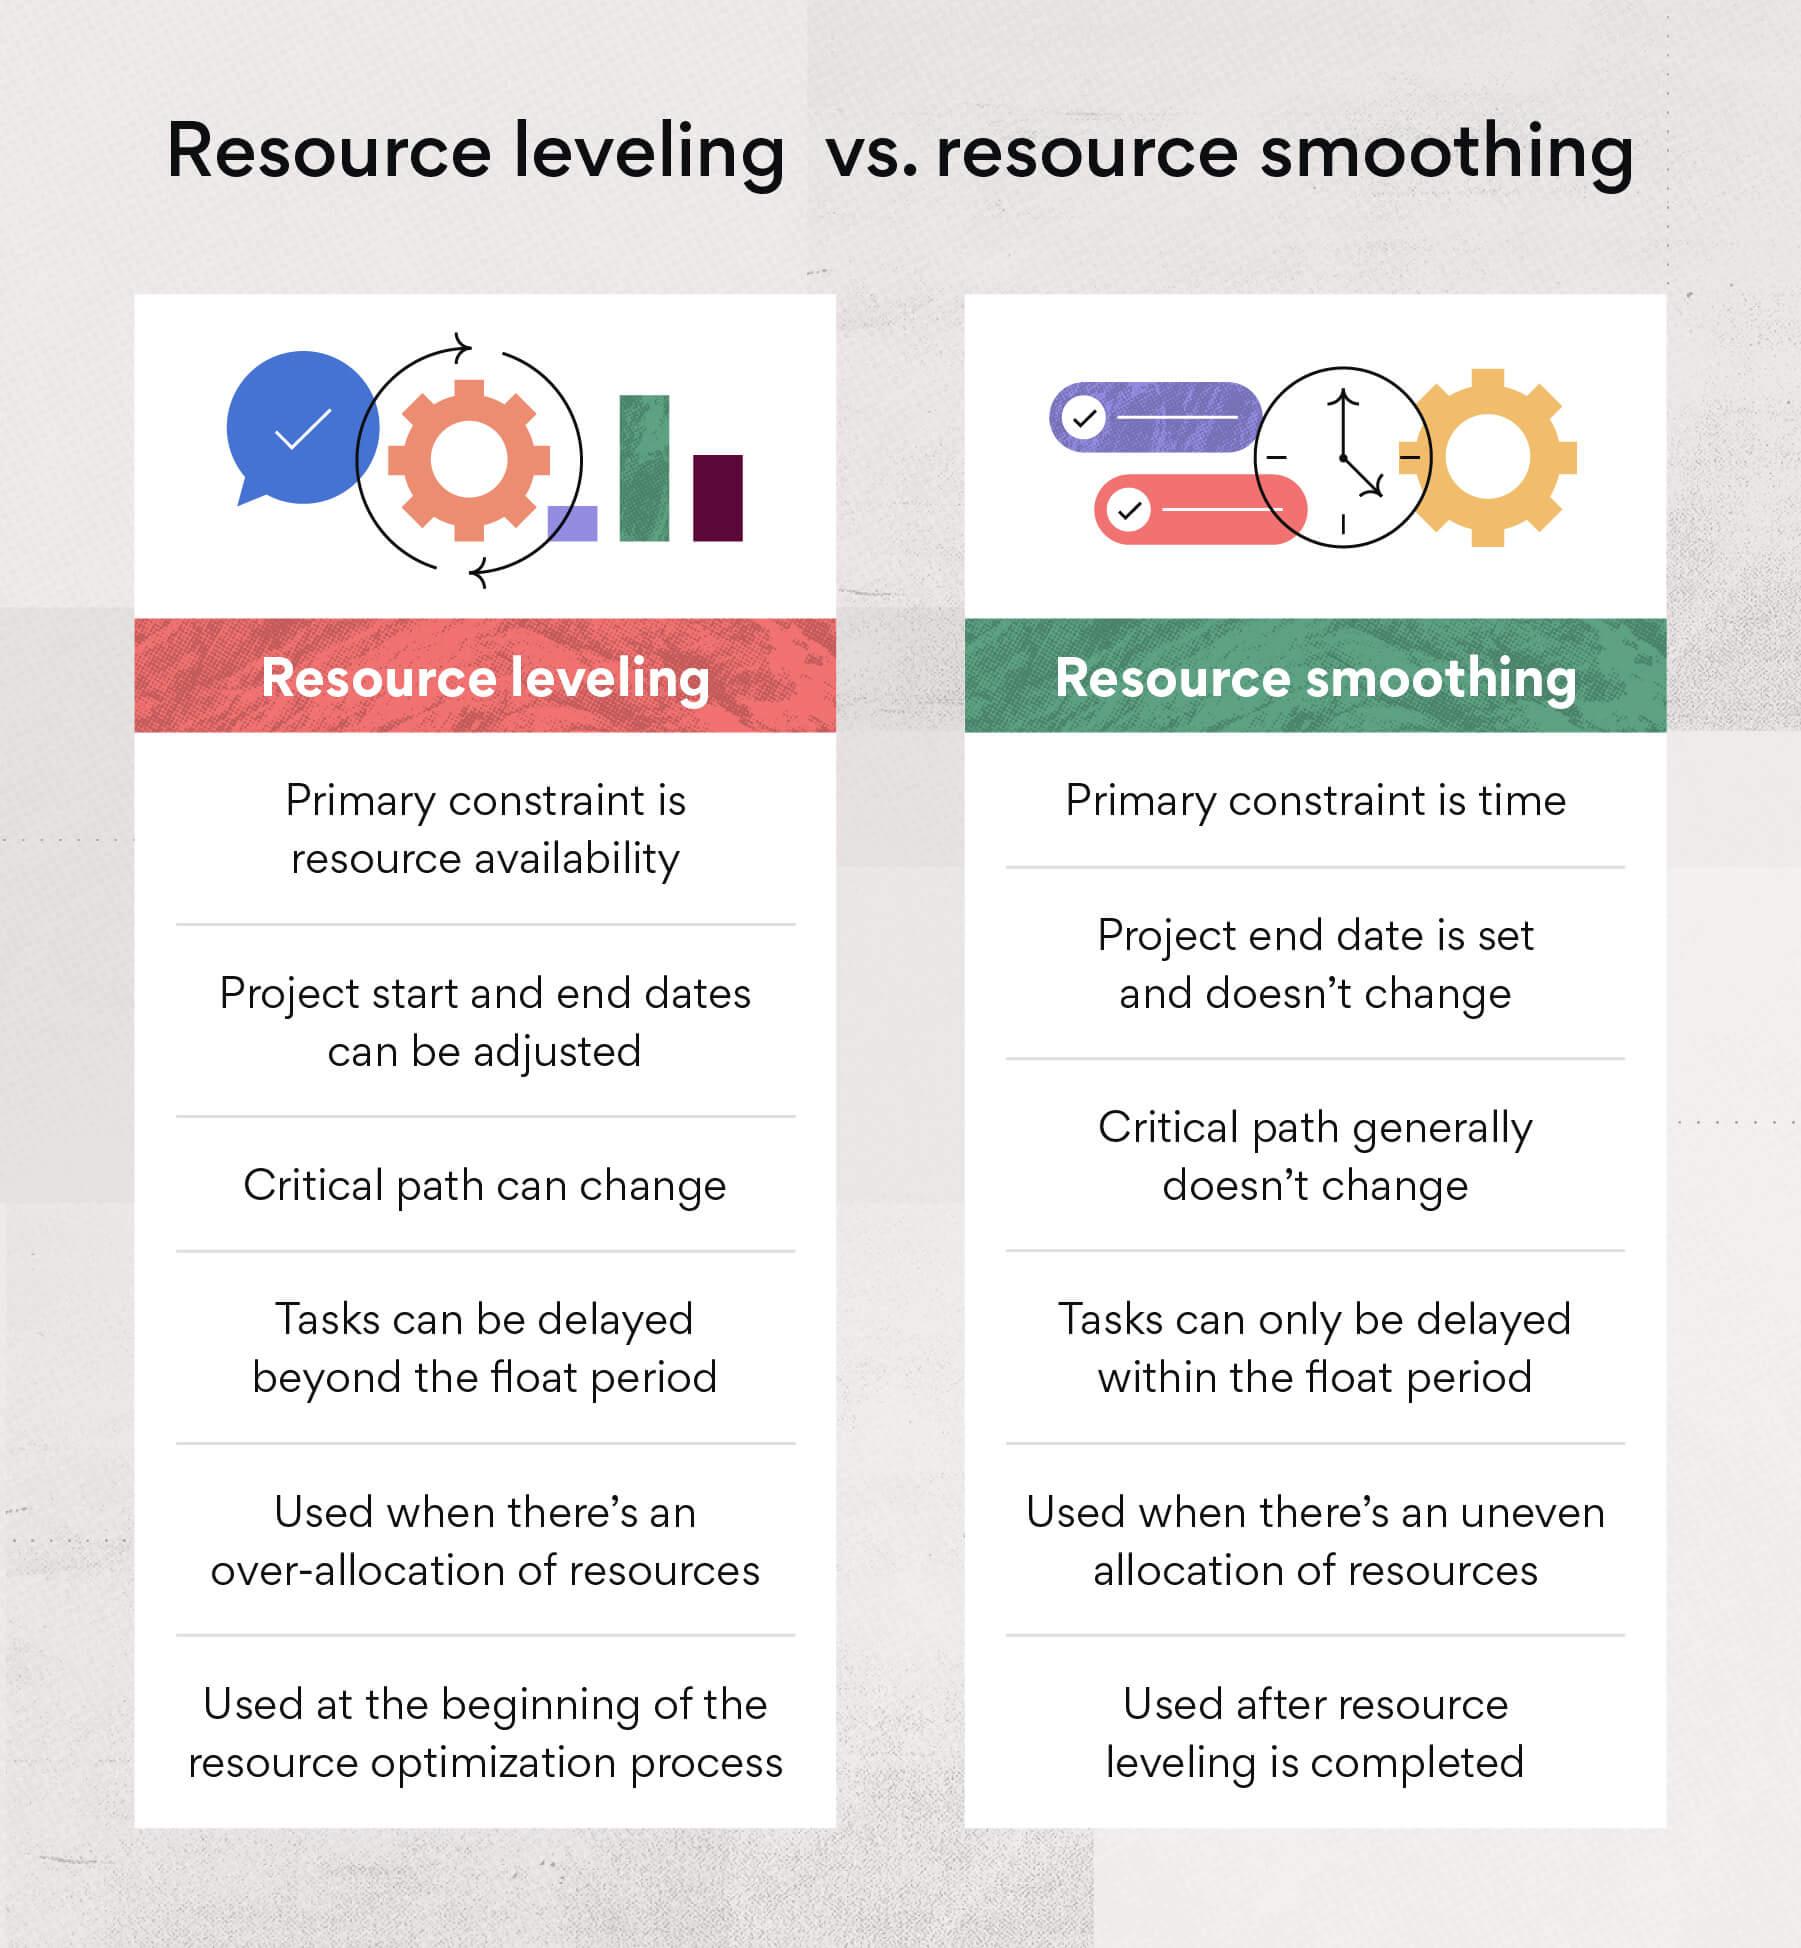 Resource leveling vs. smoothing